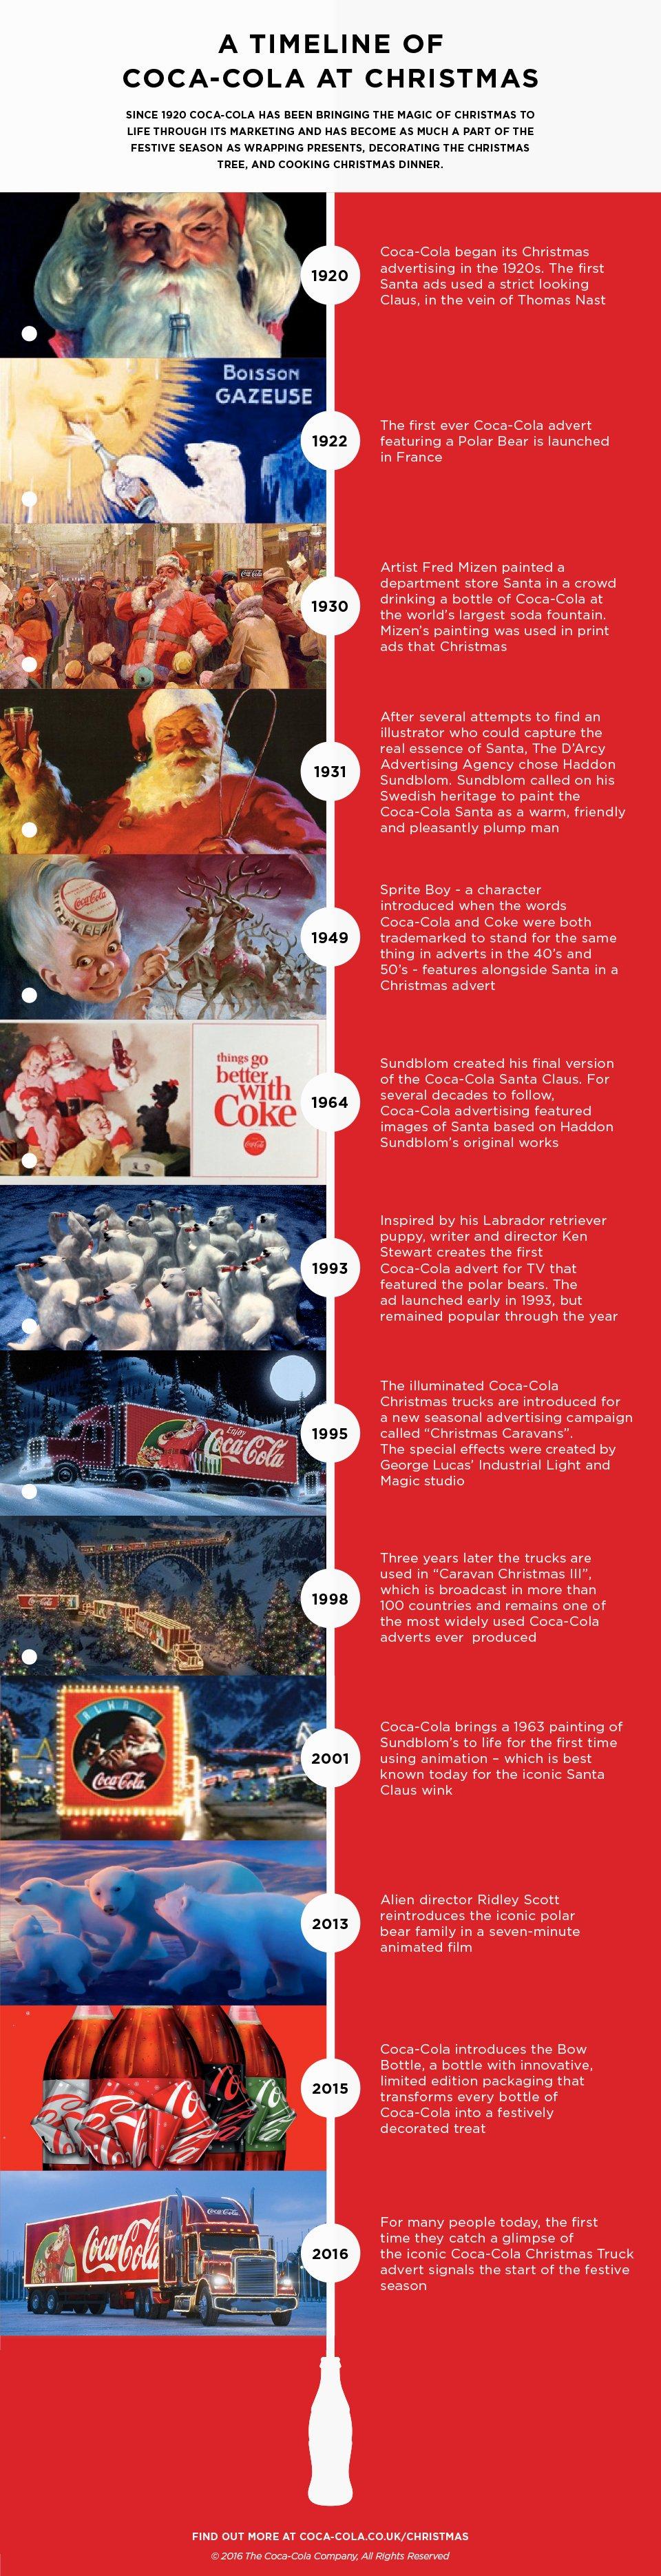 Coke Christmas Ads.Coca Cola Christmas Campaign Timeline Infographic Coca